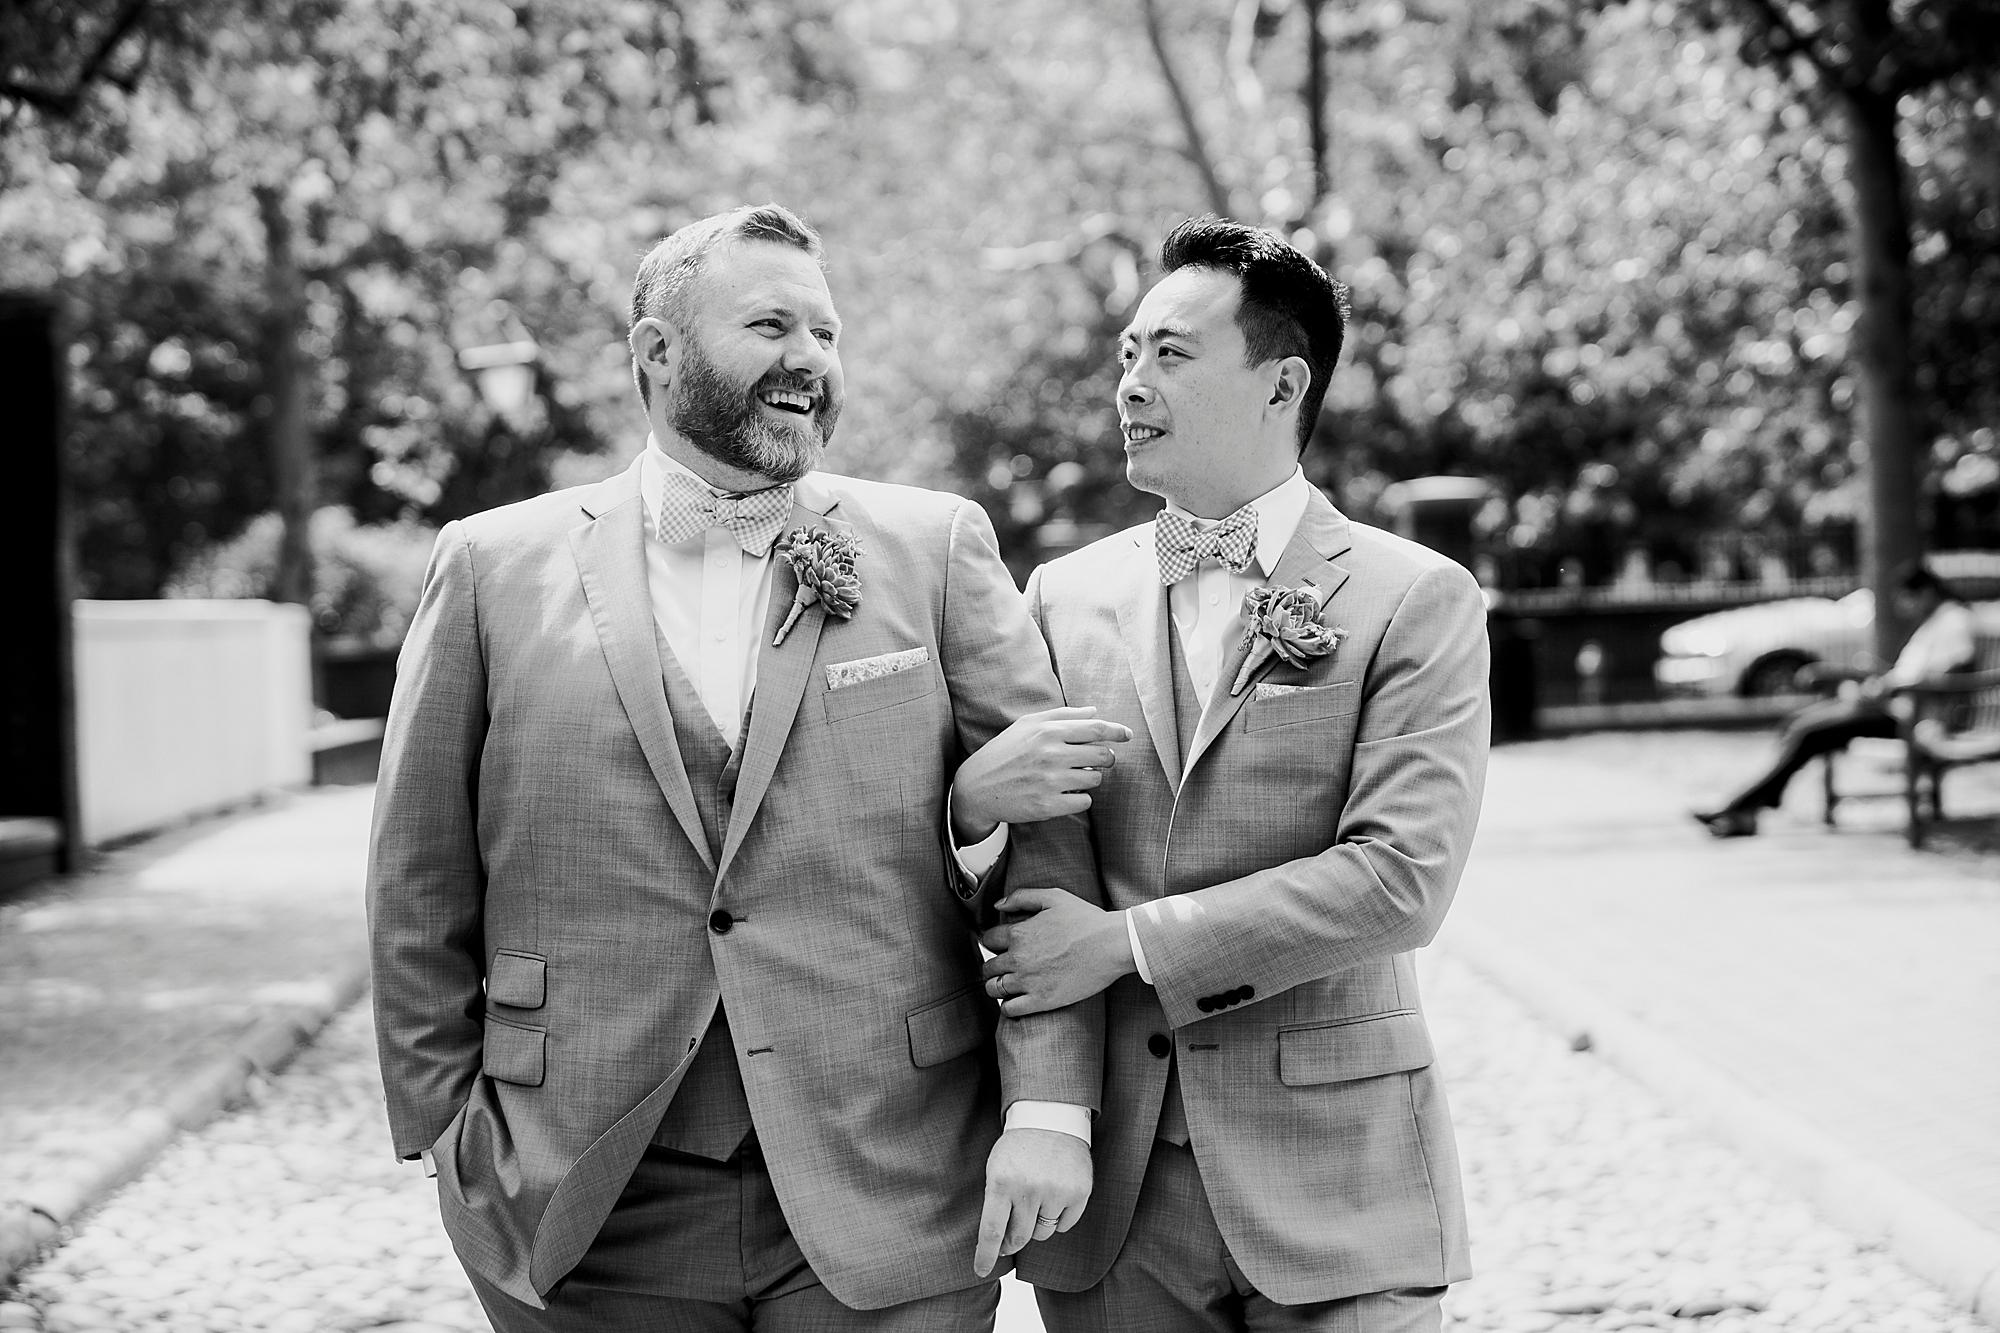 Dan_and_Byron_Love_by_Joe_Mac_Philadelphia_Wedding_LGBTQ_Photography_Gay_Independence_visitor_Center_44.JPG